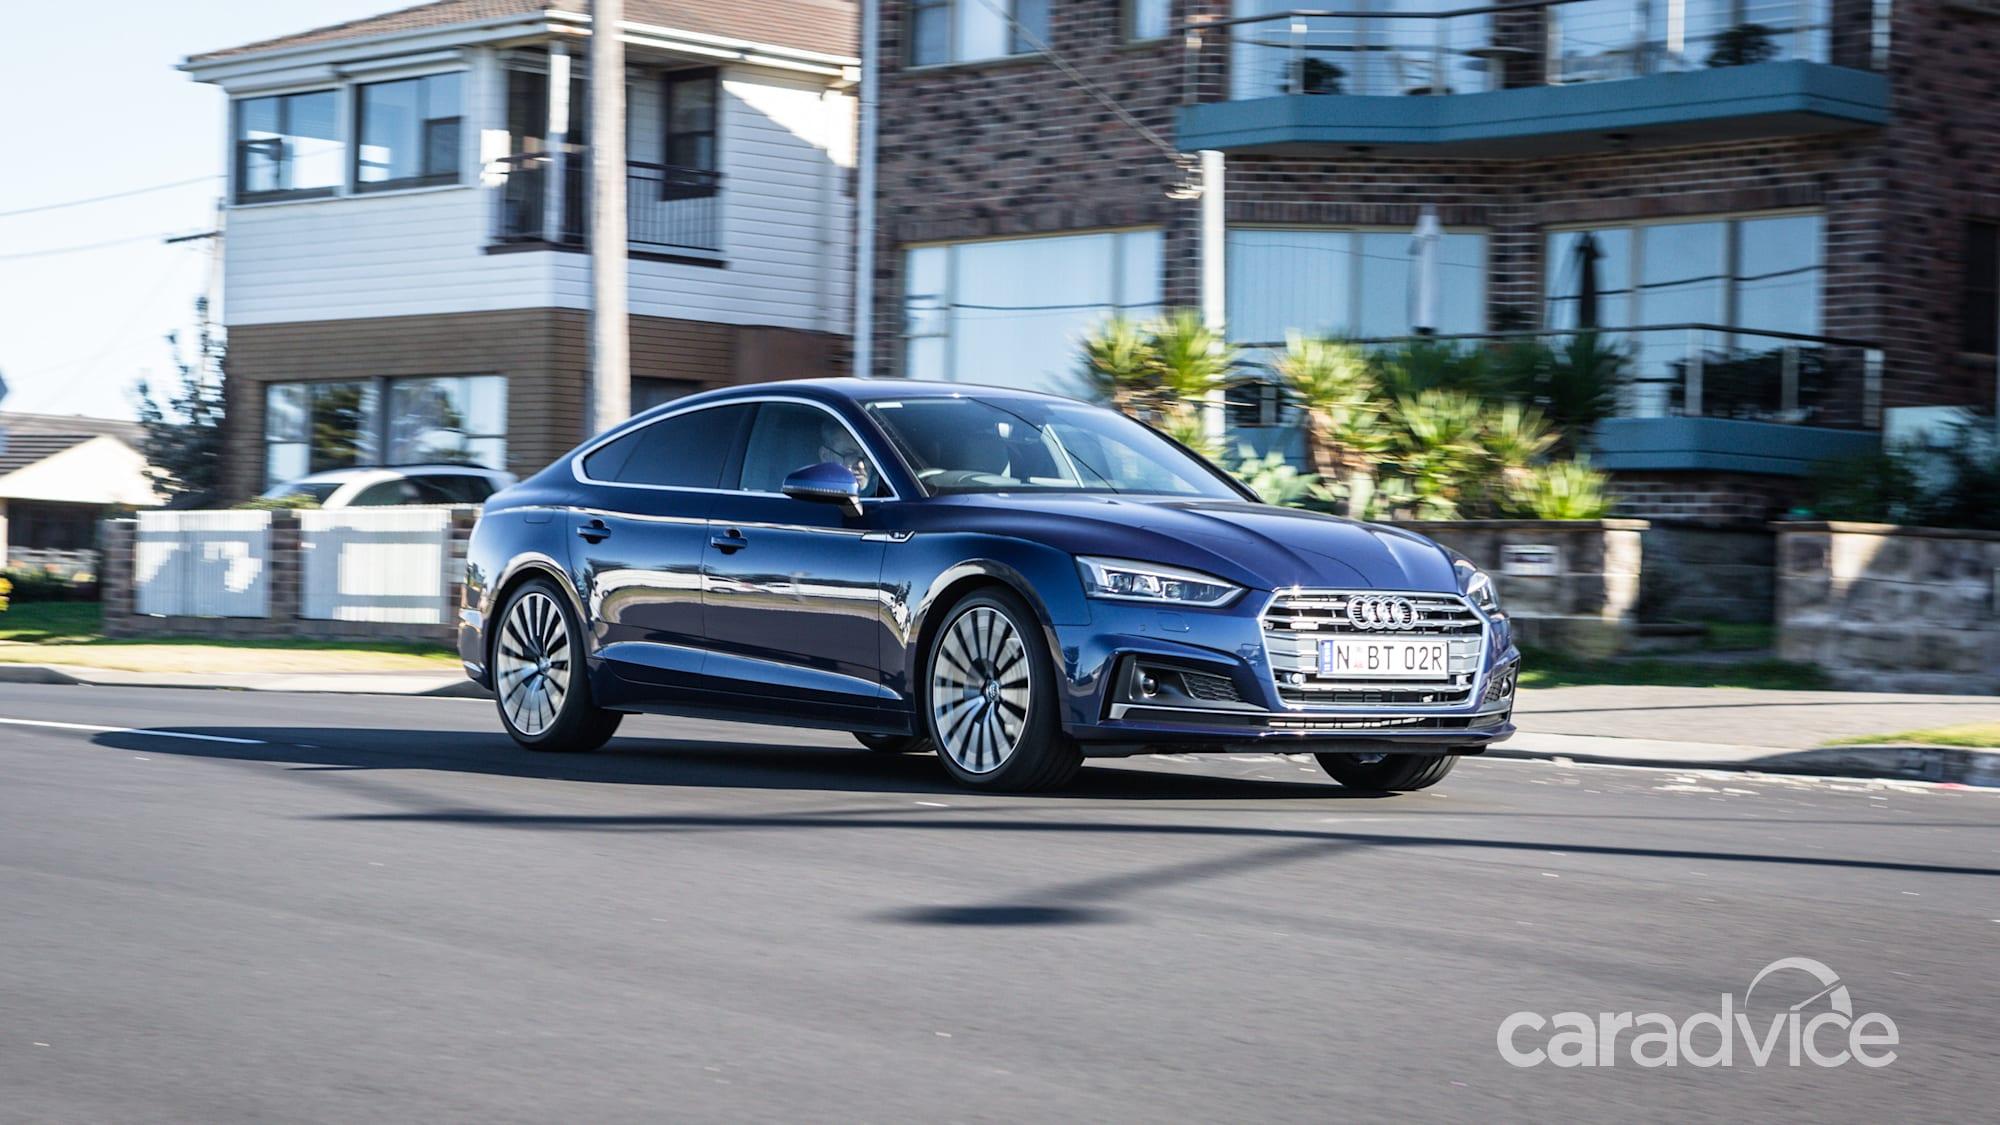 2017 Audi A5 Sportback 2.0 TFSI quattro review | CarAdvice